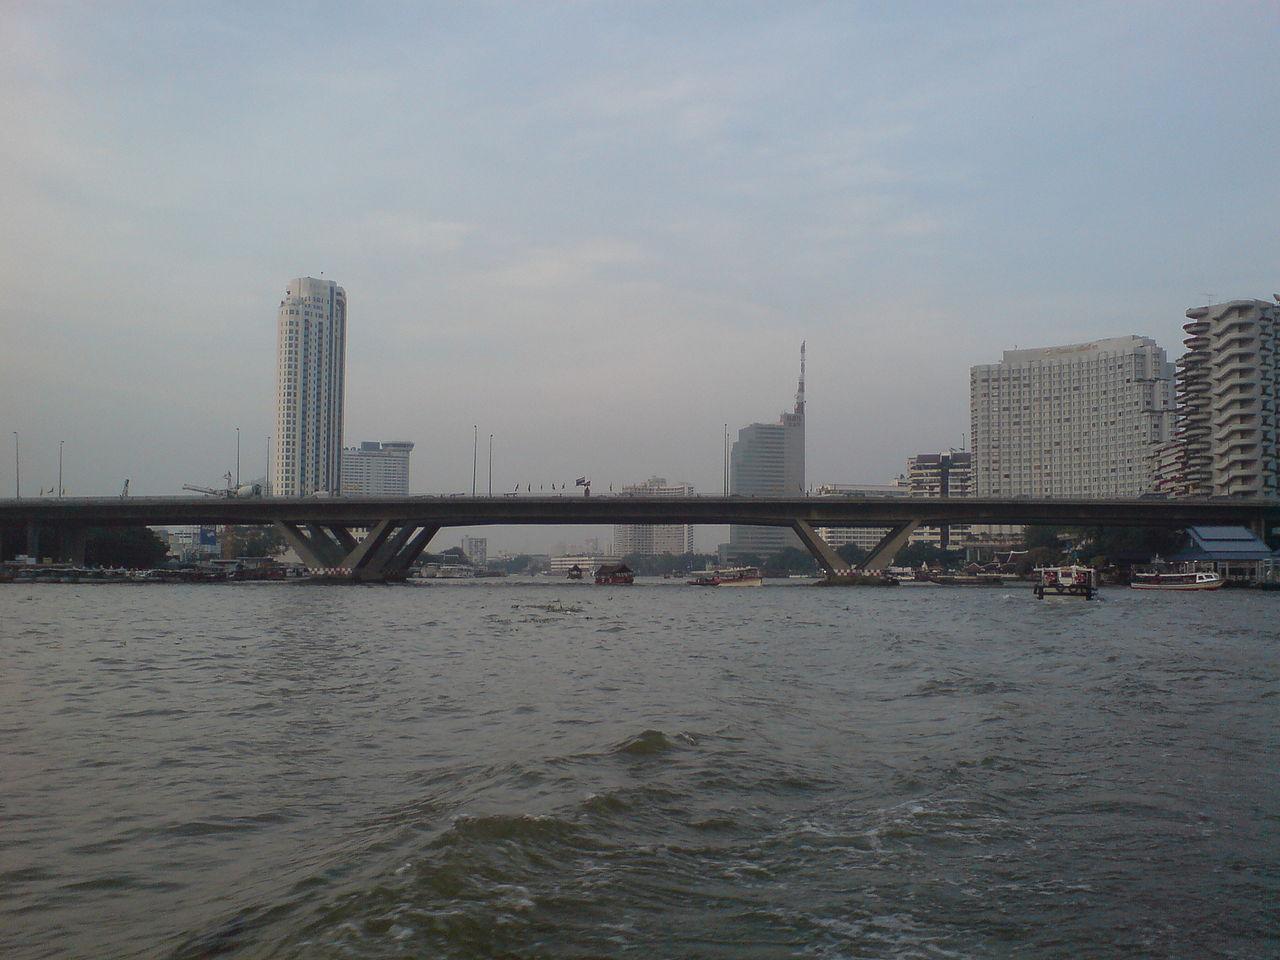 King Taksin Bridge